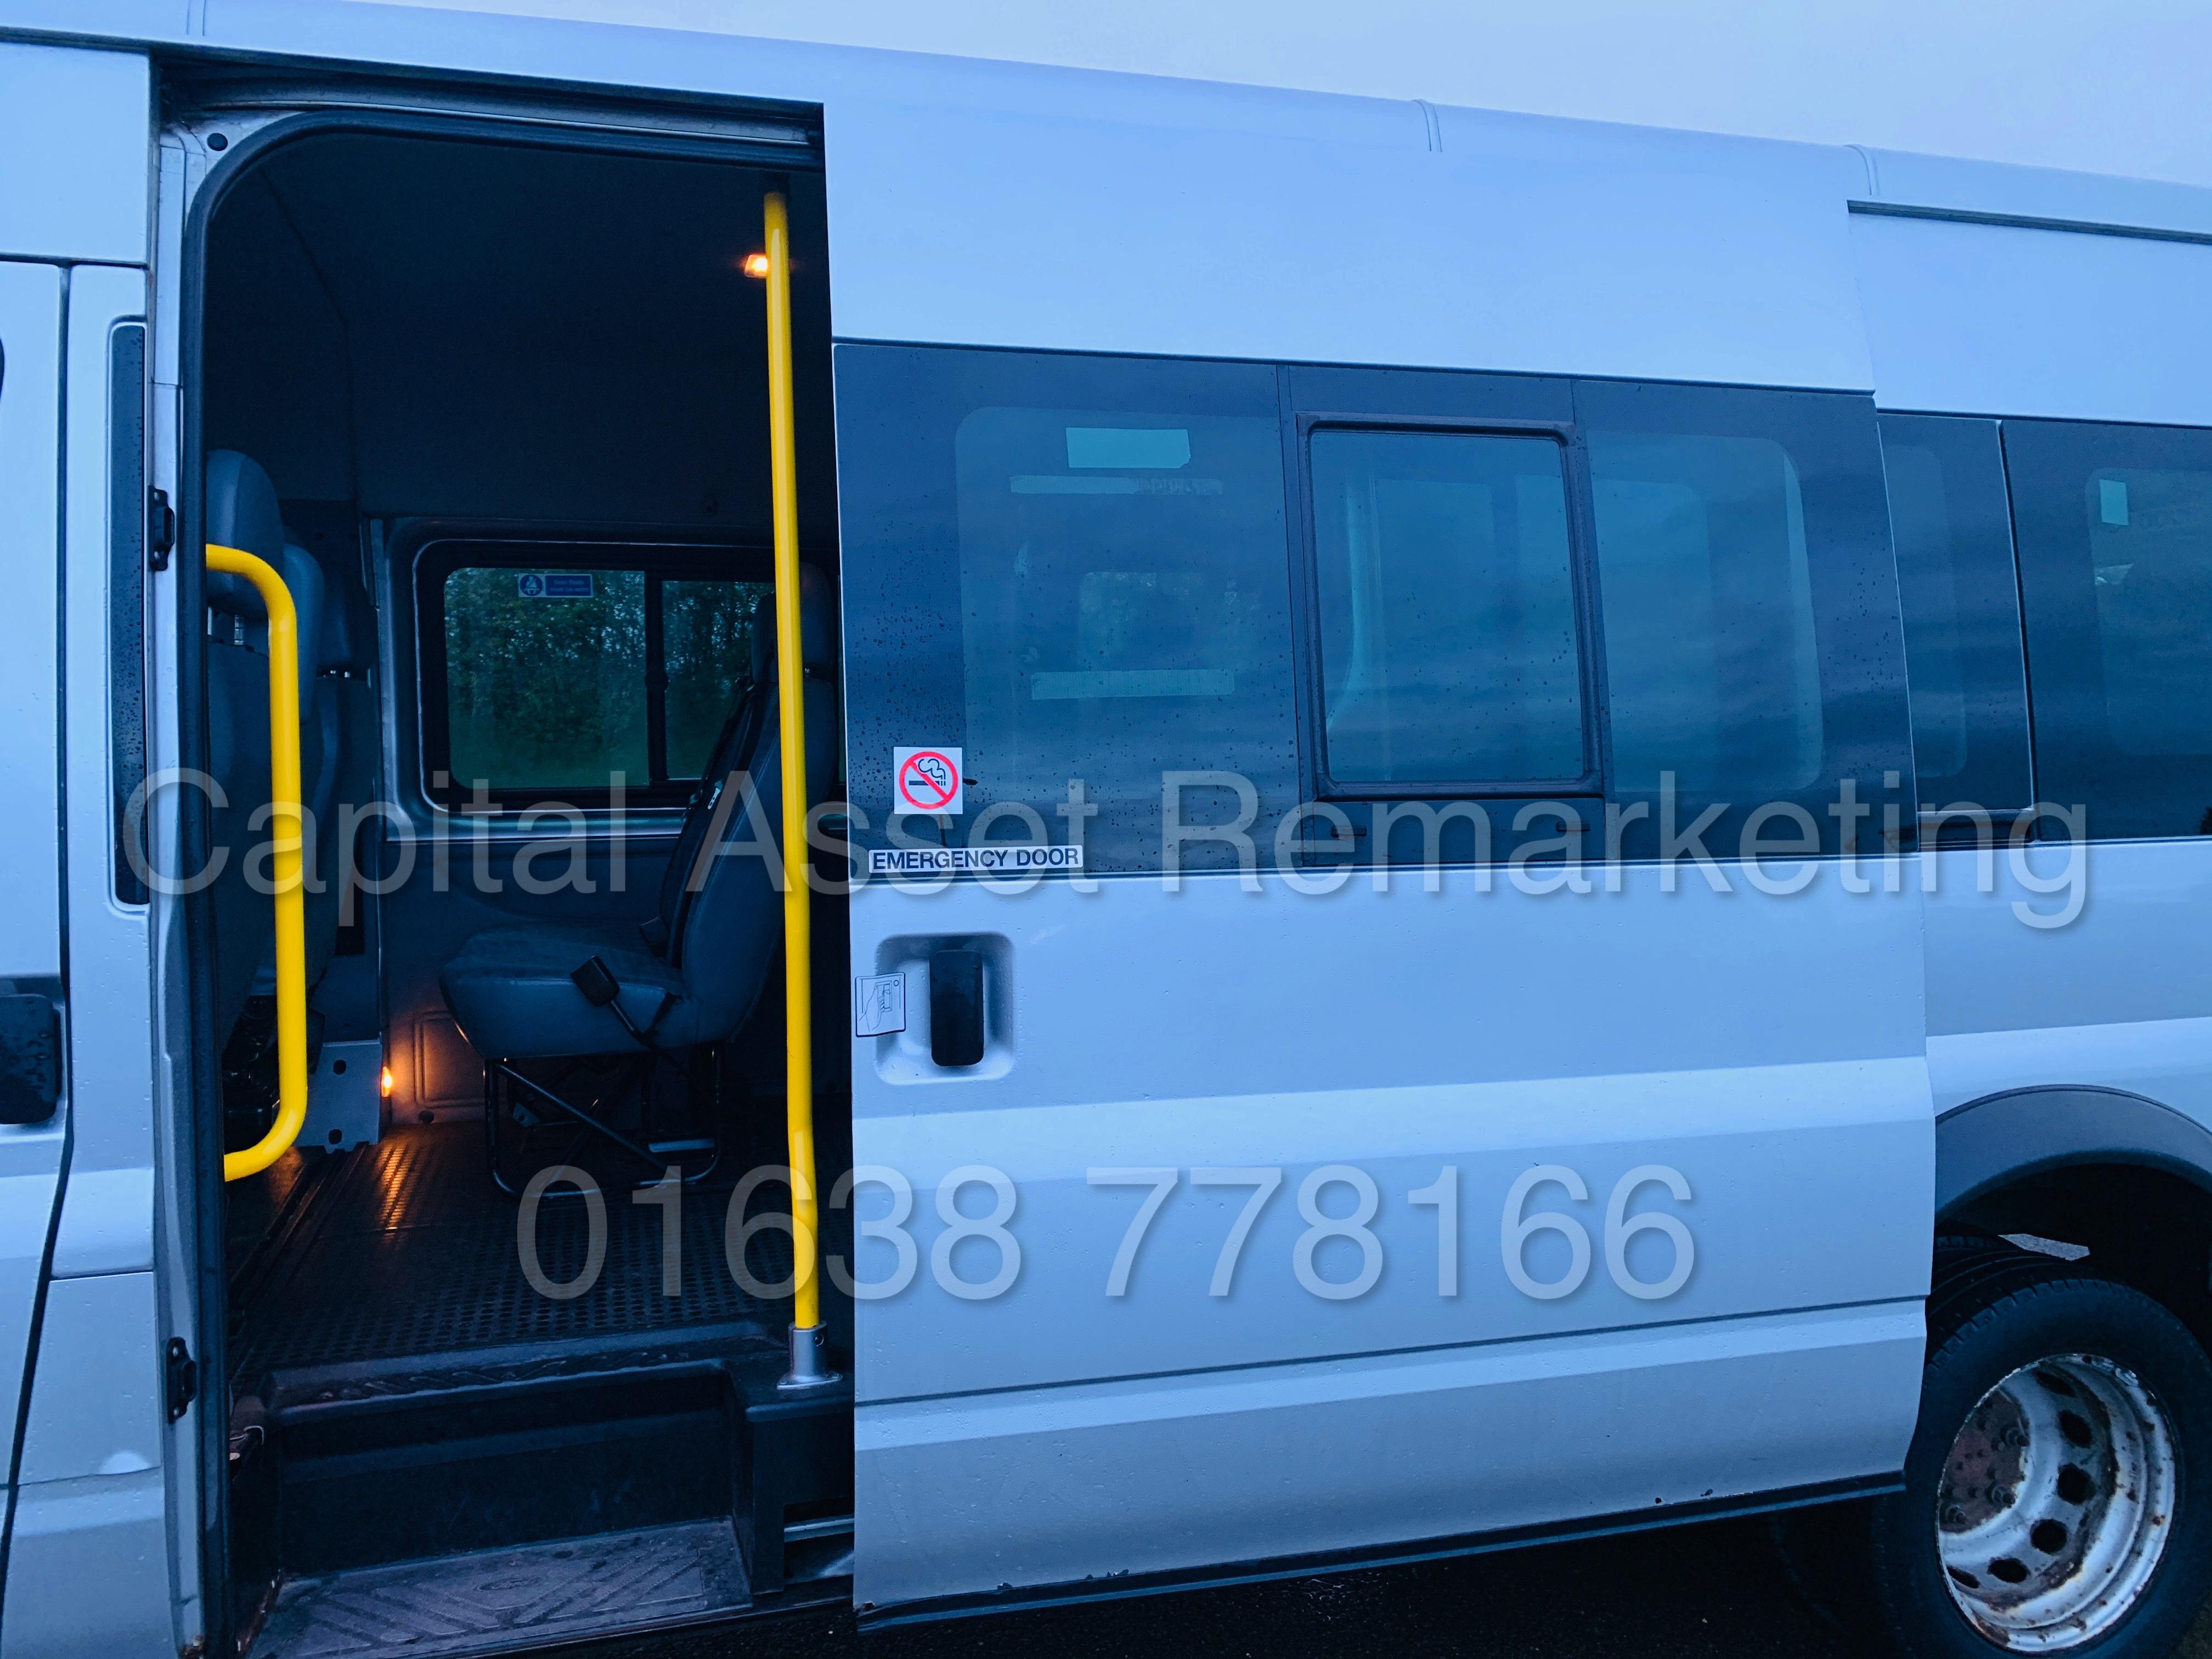 FORD TRANSIT 135 T430 RWD *XLWB -17 SEATER MINI-BUS* (2013) '2.2 TDCI - 135 BHP - 6 SPEED' (1 OWNER) - Image 23 of 43